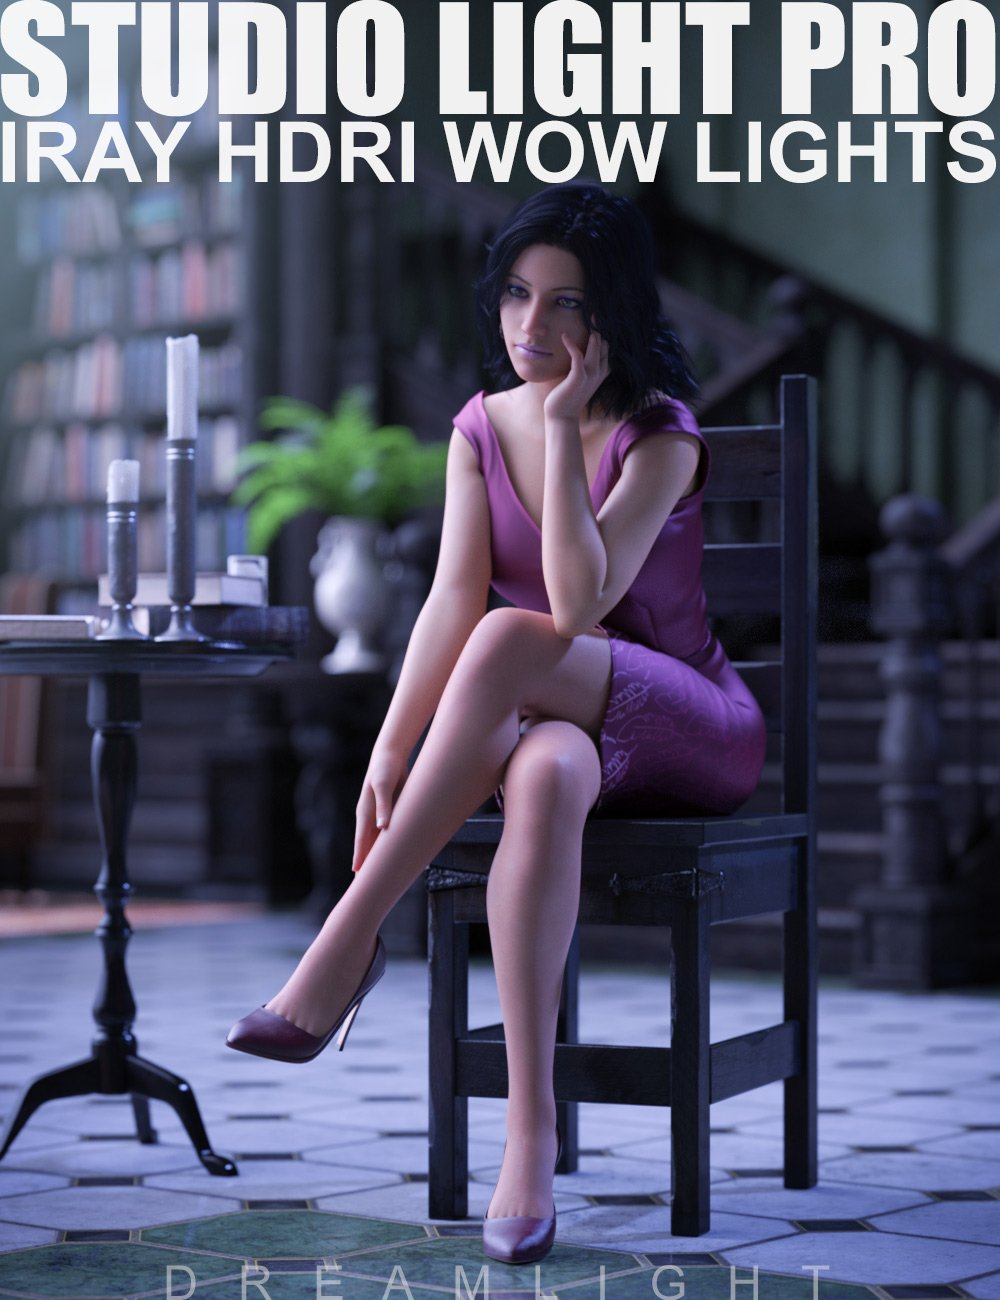 Studio Light PRO HDRI Iray Wow Lights by: Dreamlight, 3D Models by Daz 3D